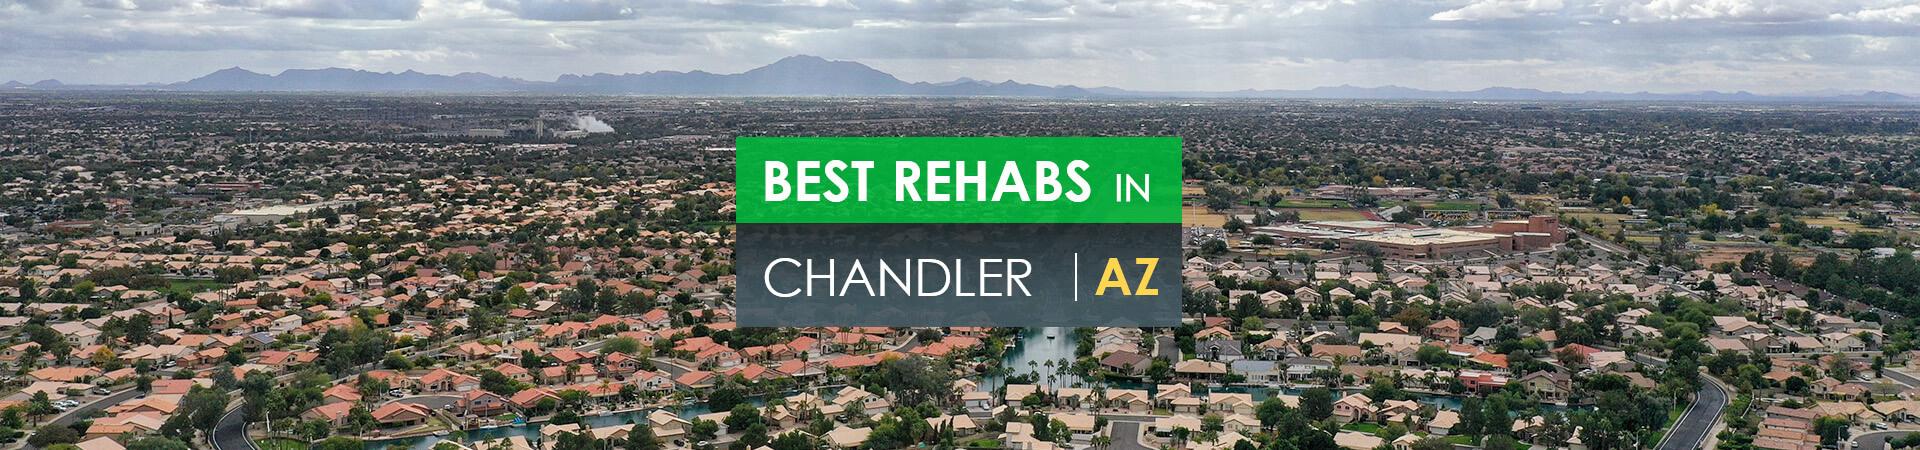 Best rehabs in Chandler, AZ